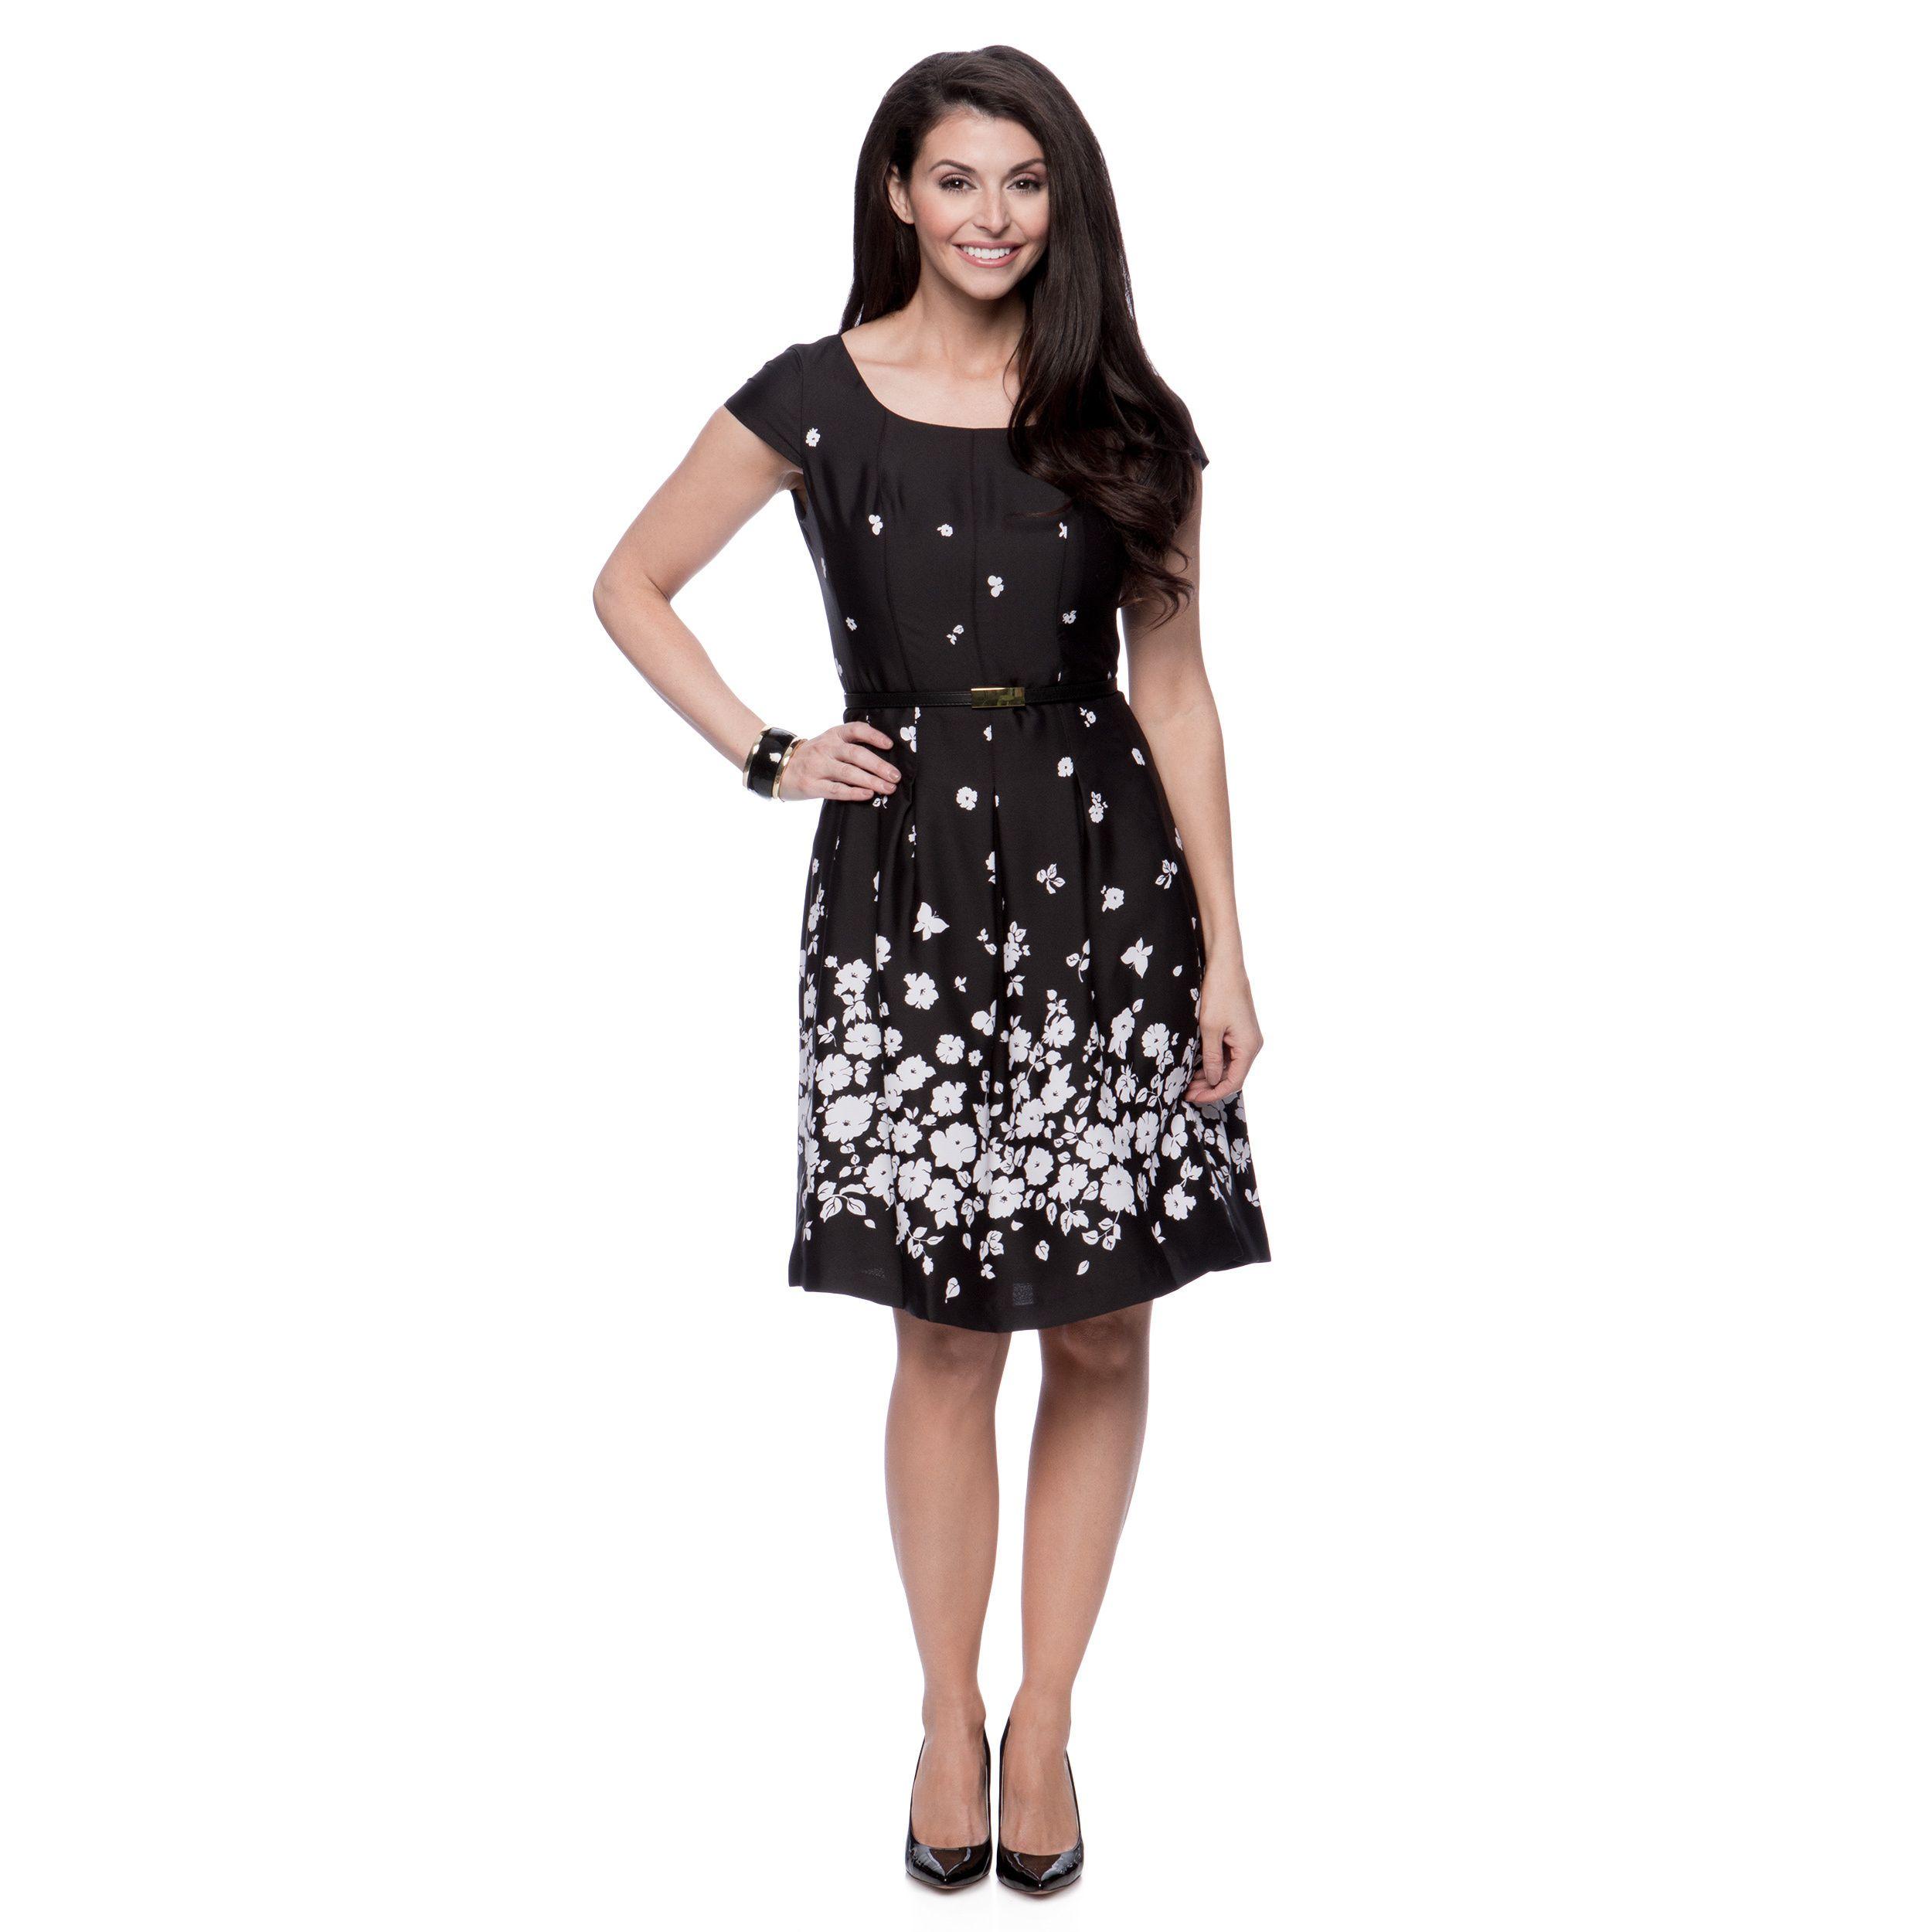 Look Cute Yet Comfortable In This Floral Designed Cap Sleeve Black